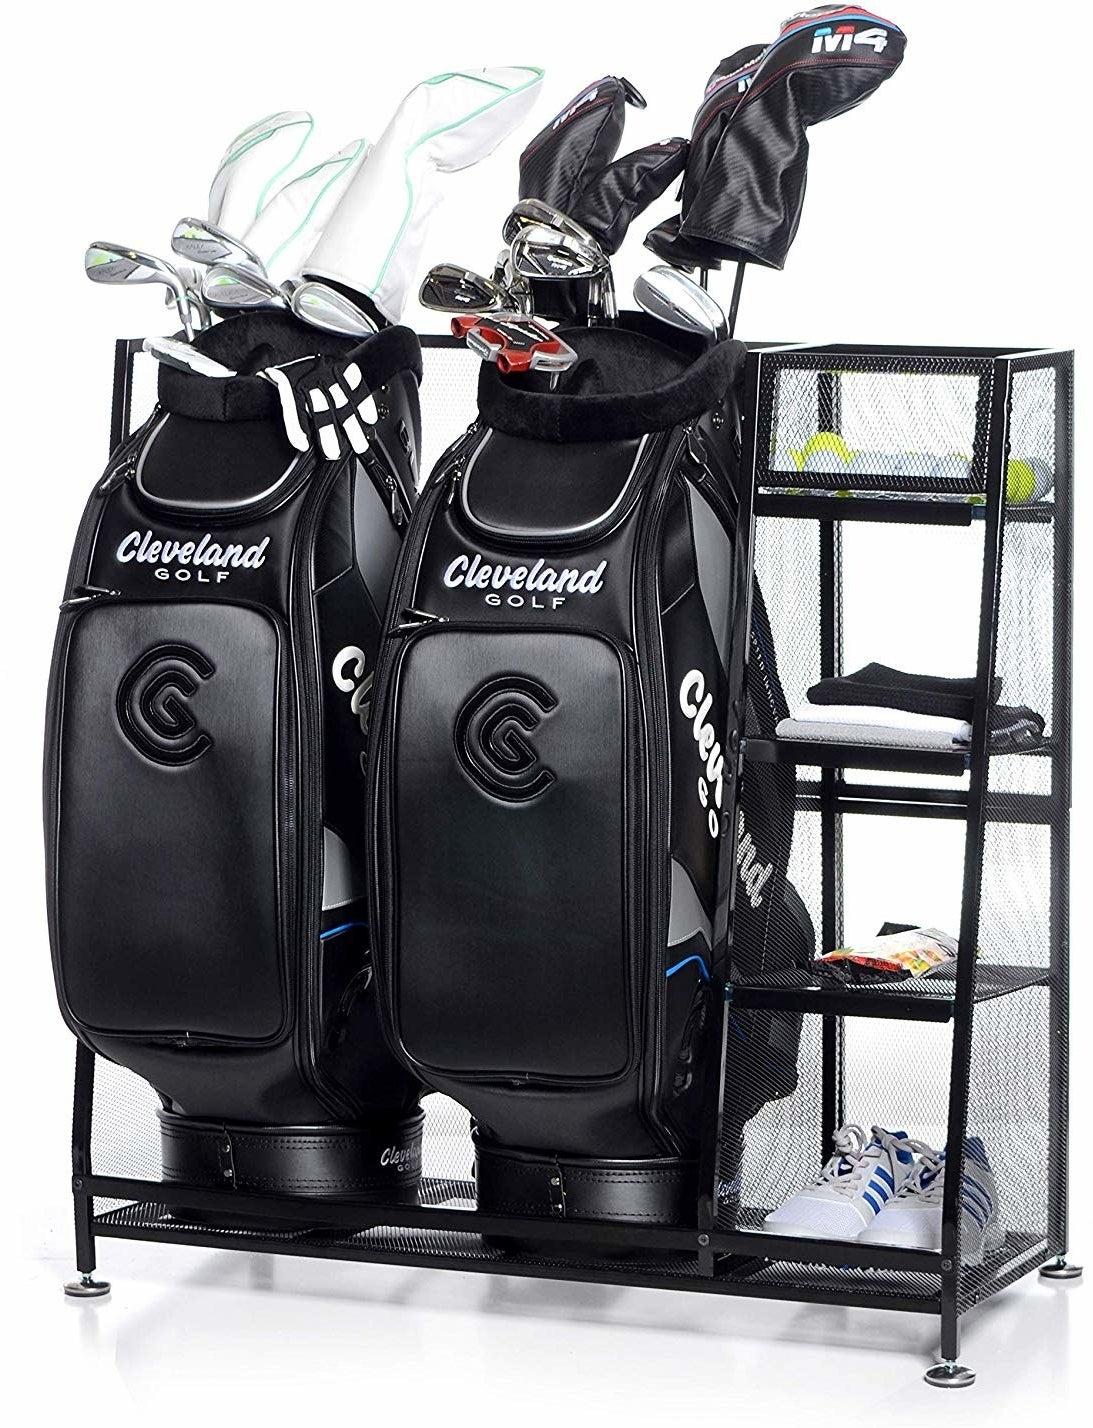 rack storing two full golf bags full of equipment, plus four shelves storing shoes, balls, or extra items